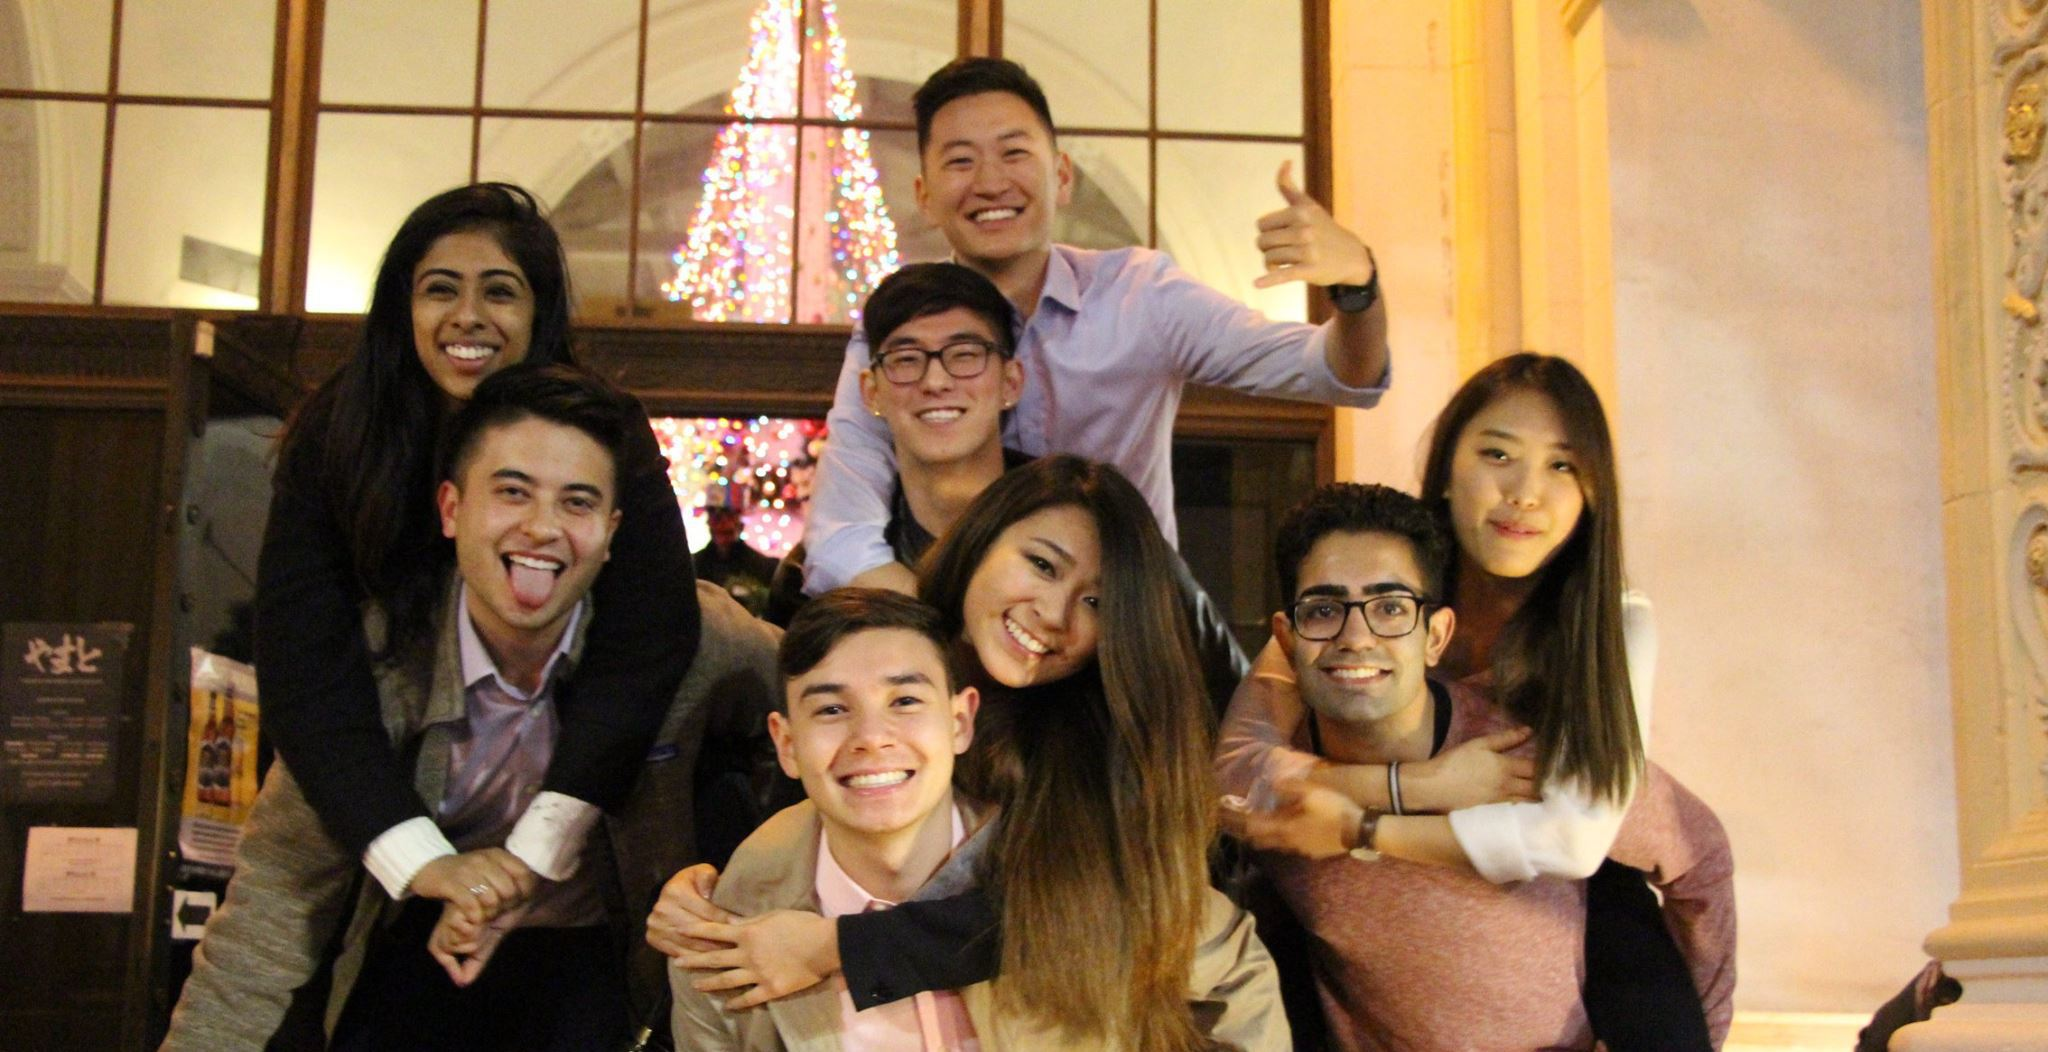 Not Pictured:  John Lee, Kevin Yu, Sabrina Theocharides, Timothy Luong, Tina Nguyen, Jennifer Hung